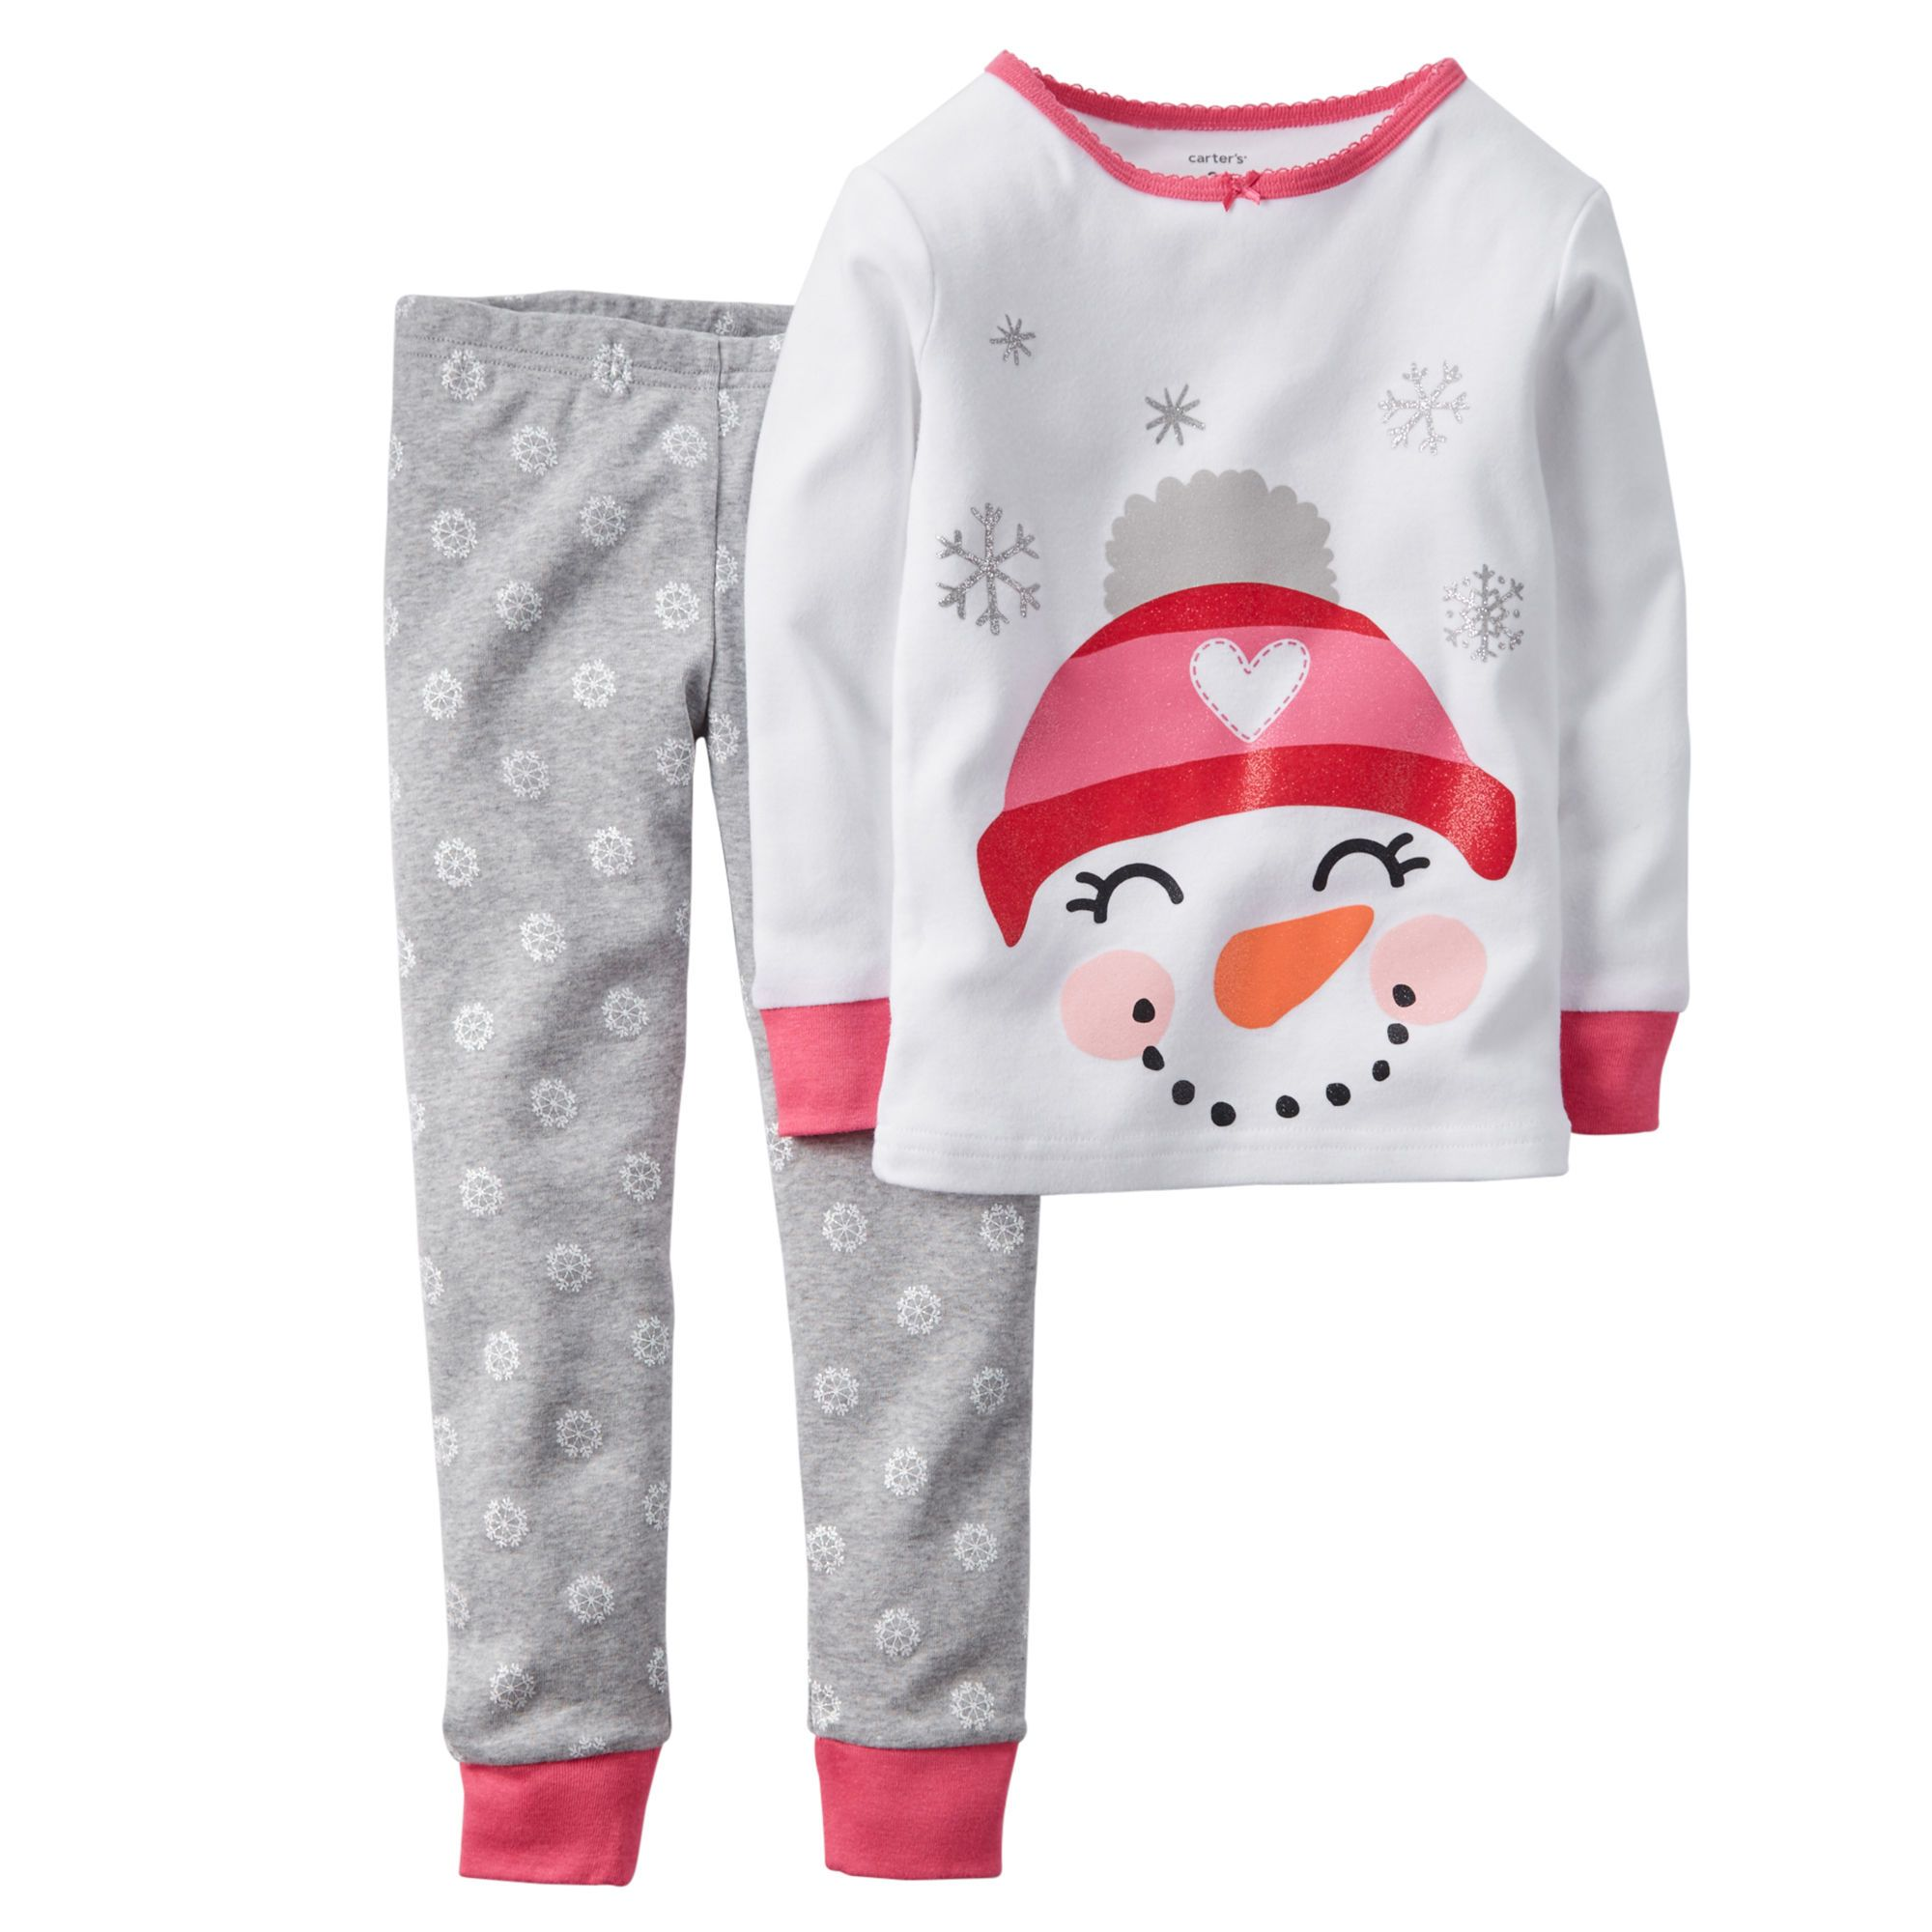 9ac8558a7 2-Piece Snug Fit Cotton PJs